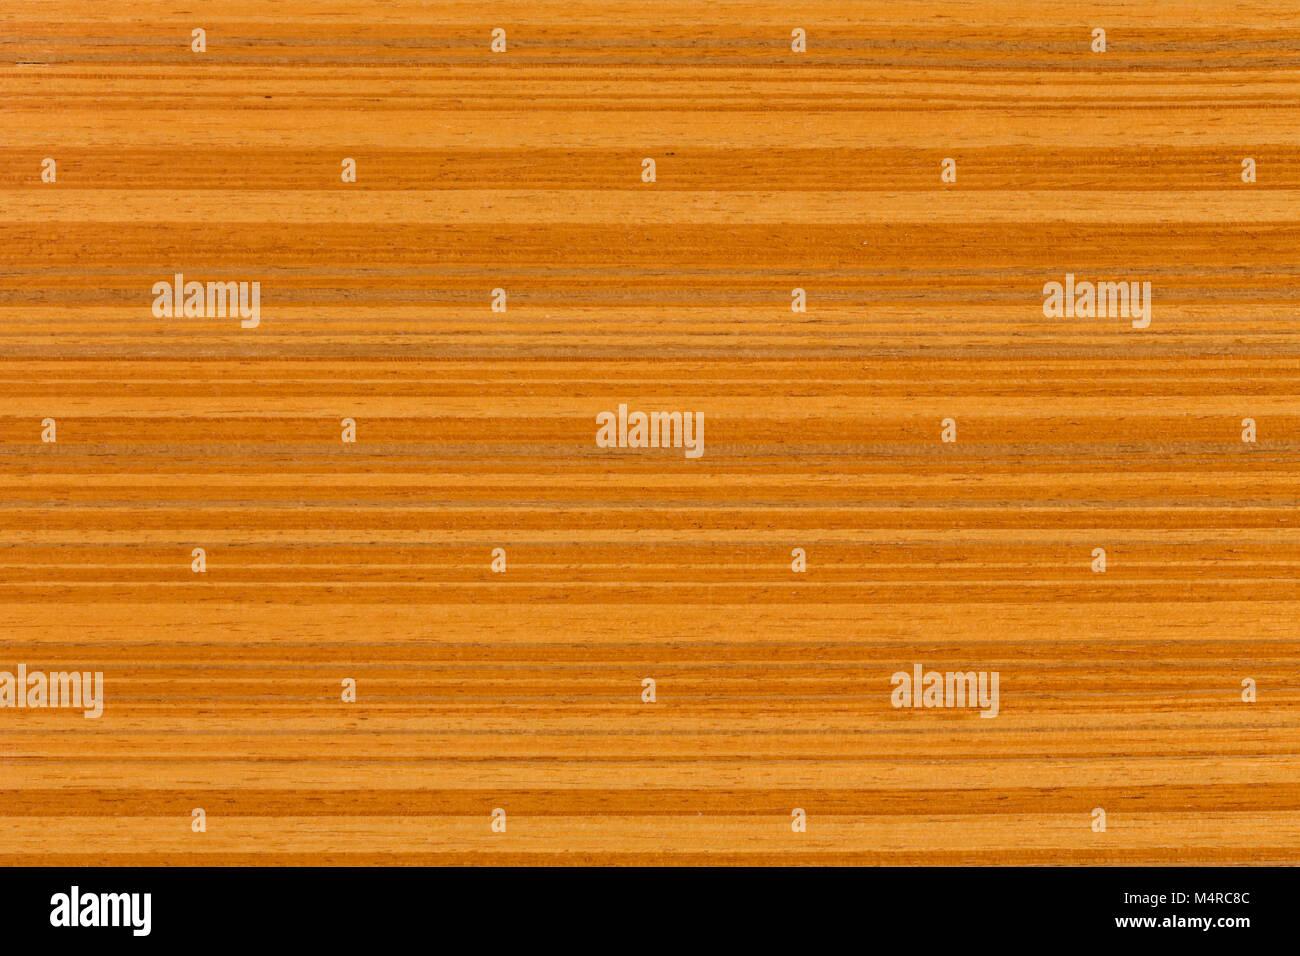 Teak Veneer Natural Wooden Texture Extremely High